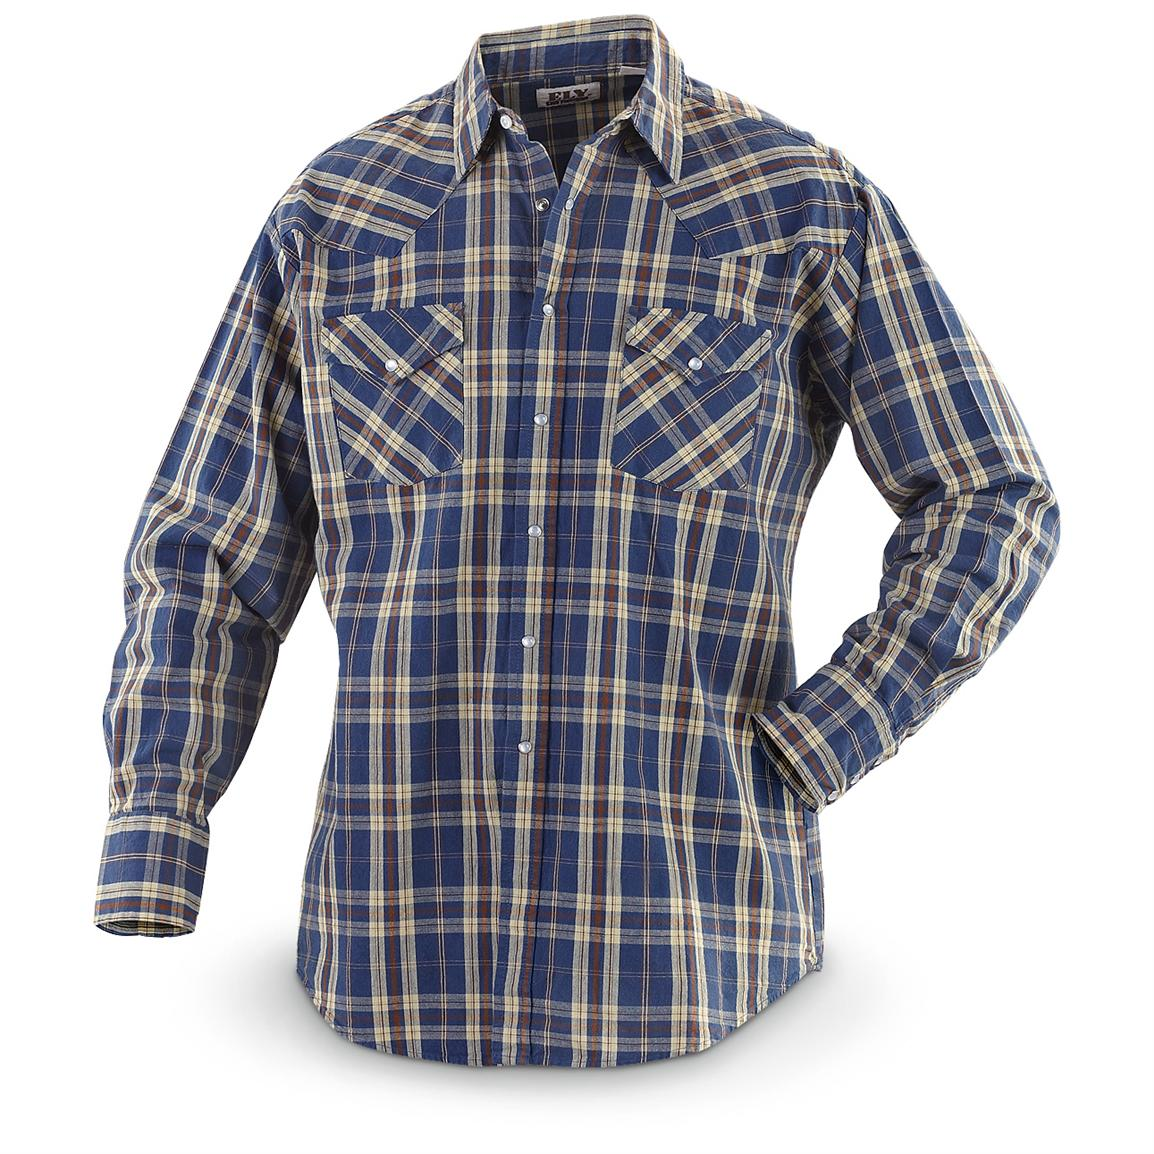 Denim clipart long sleeve shirt Long Blue Western sleeved Plaid